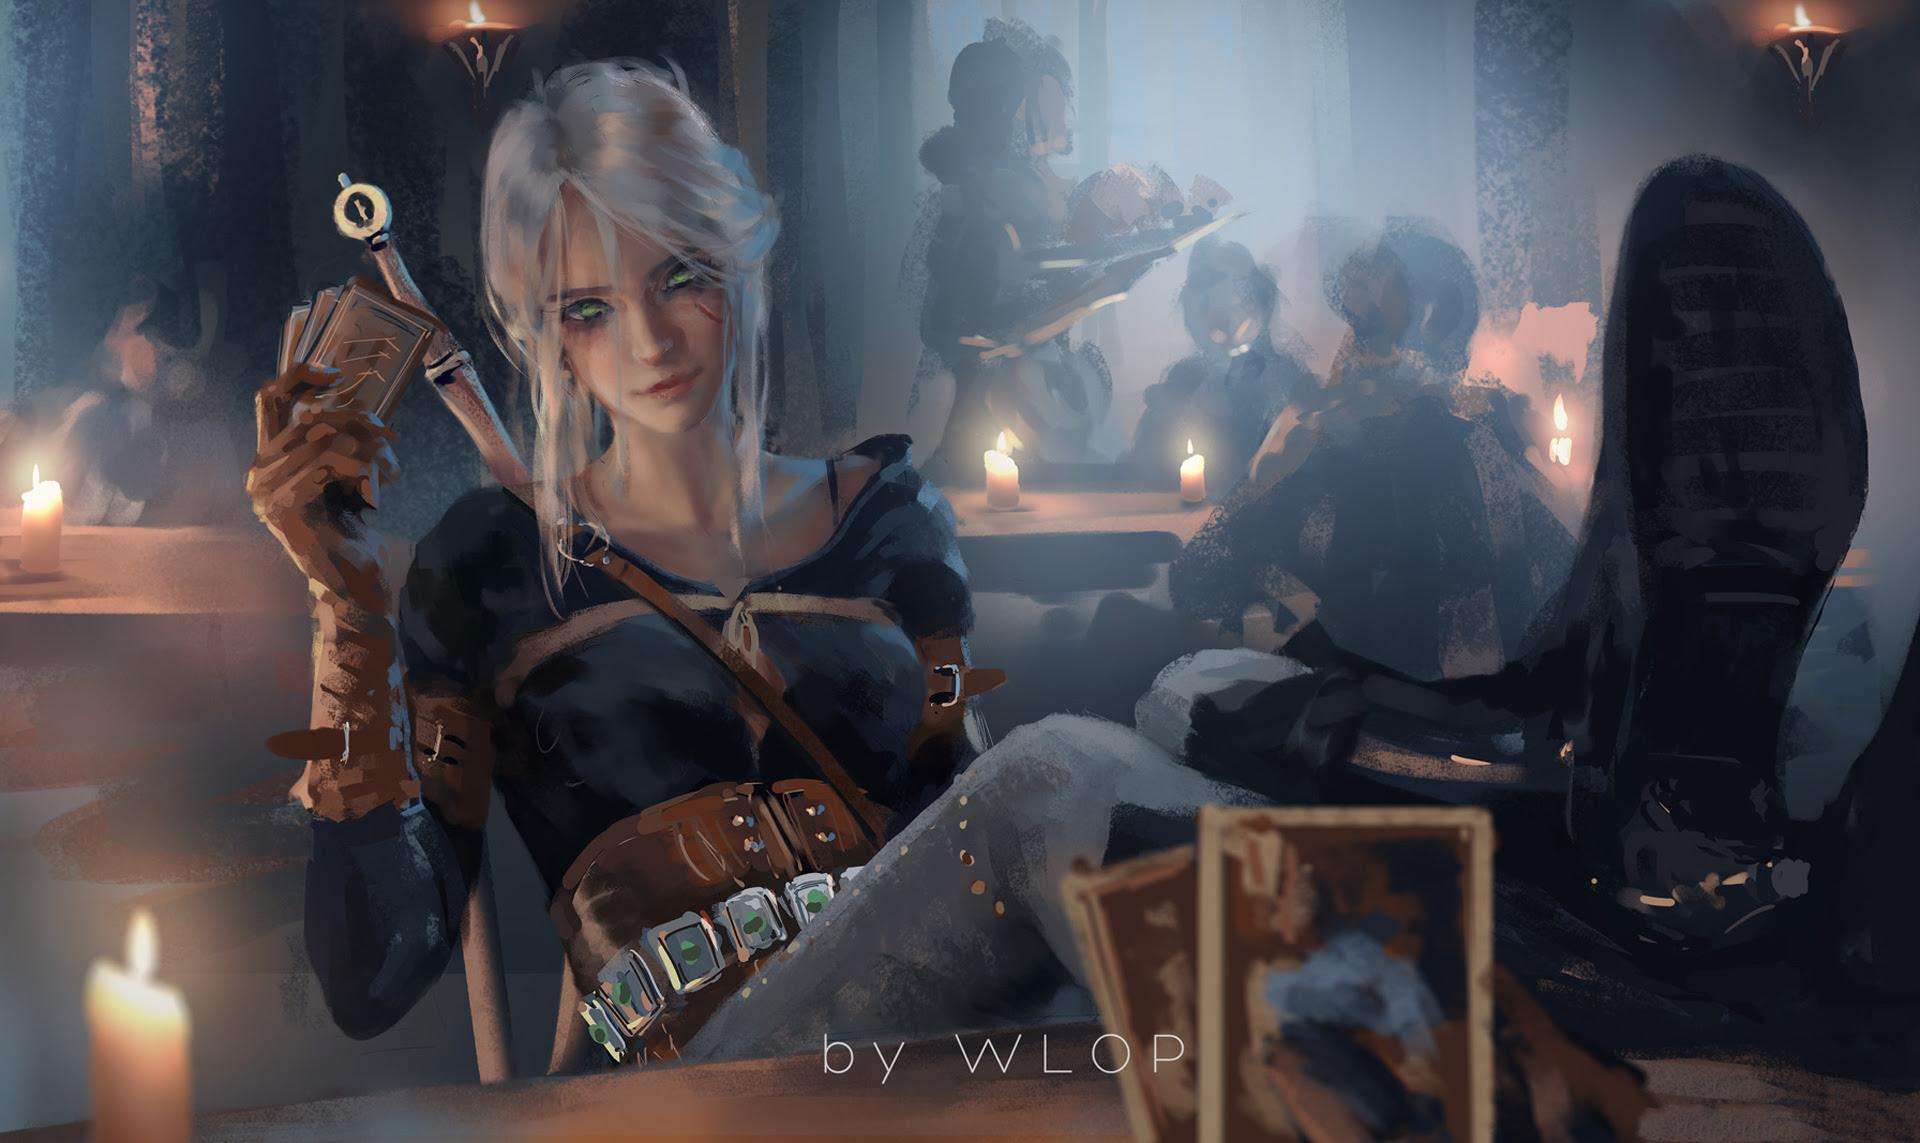 Ciri Witcher 3 Fanart Hd Games 4k Wallpapers Hd Wallpapers